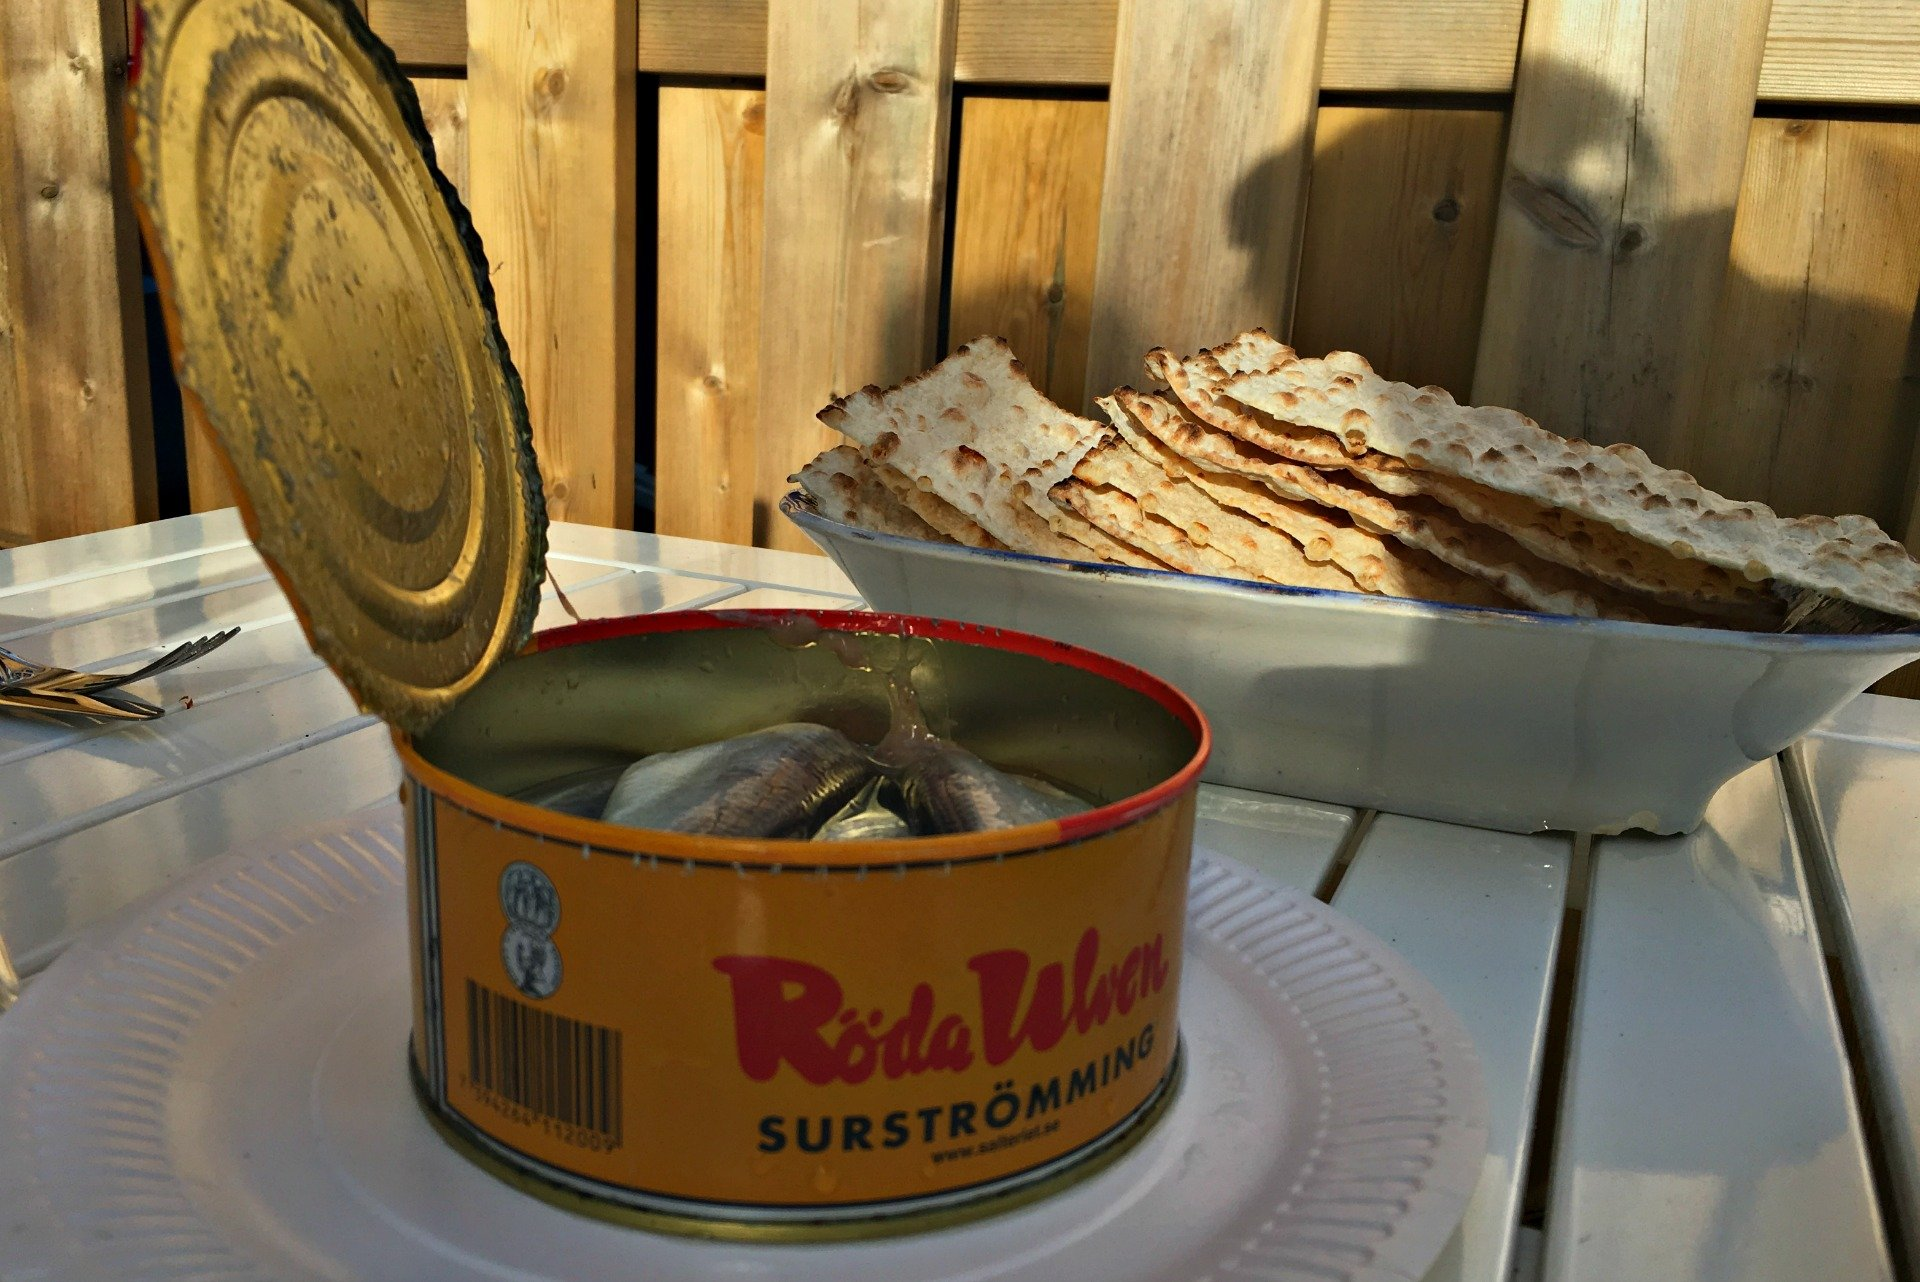 surströmming or sour herring